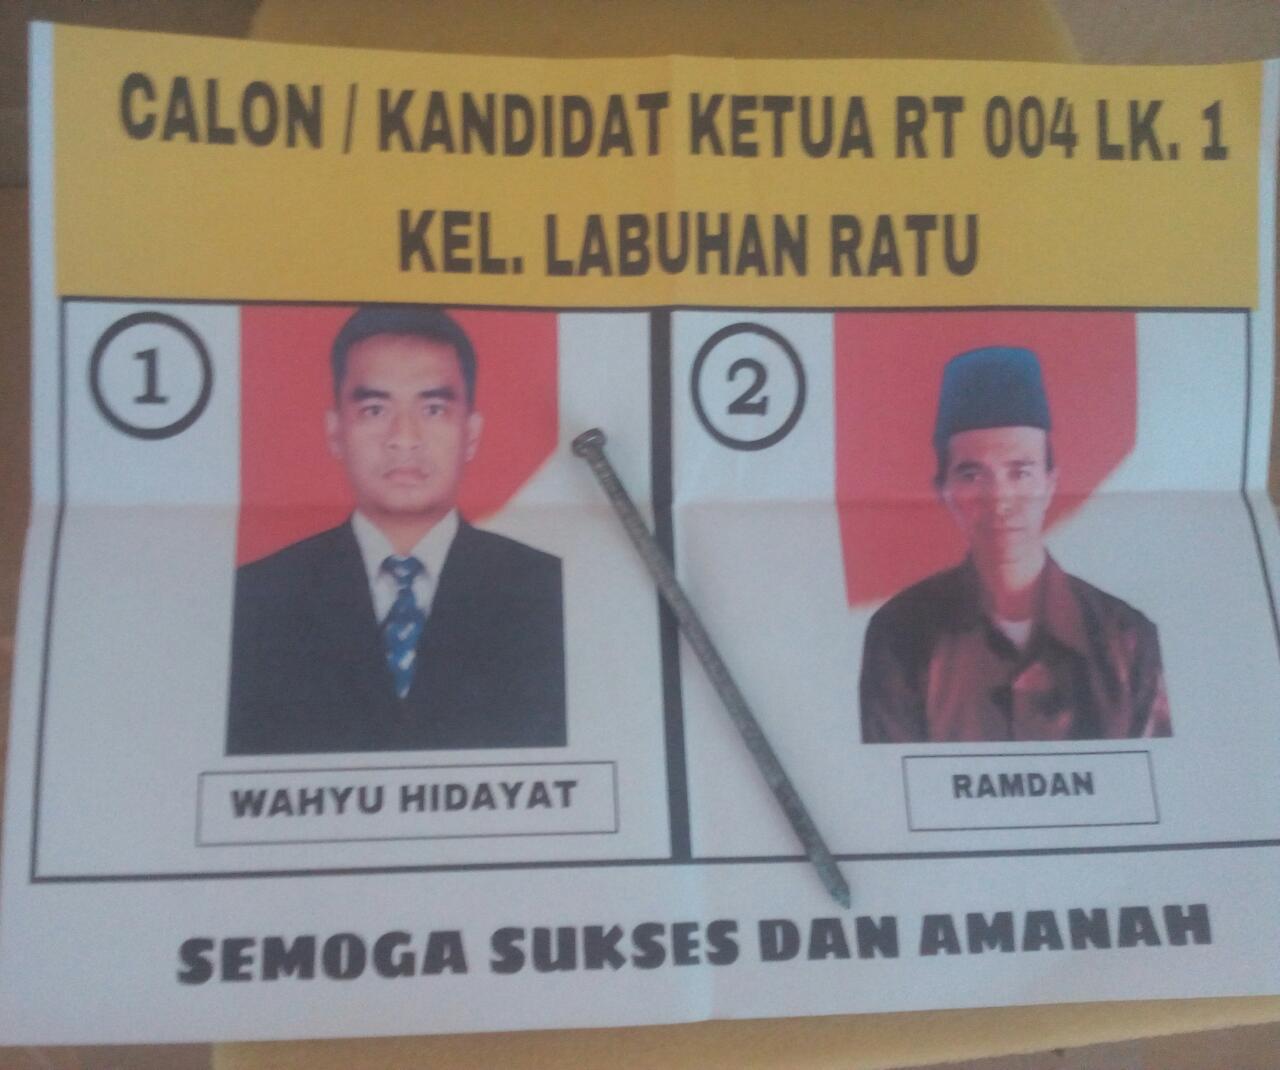 Pemilihan RT 04 Labuhan Ratu Akhirnya di Gelar, Ramdan Pemenang